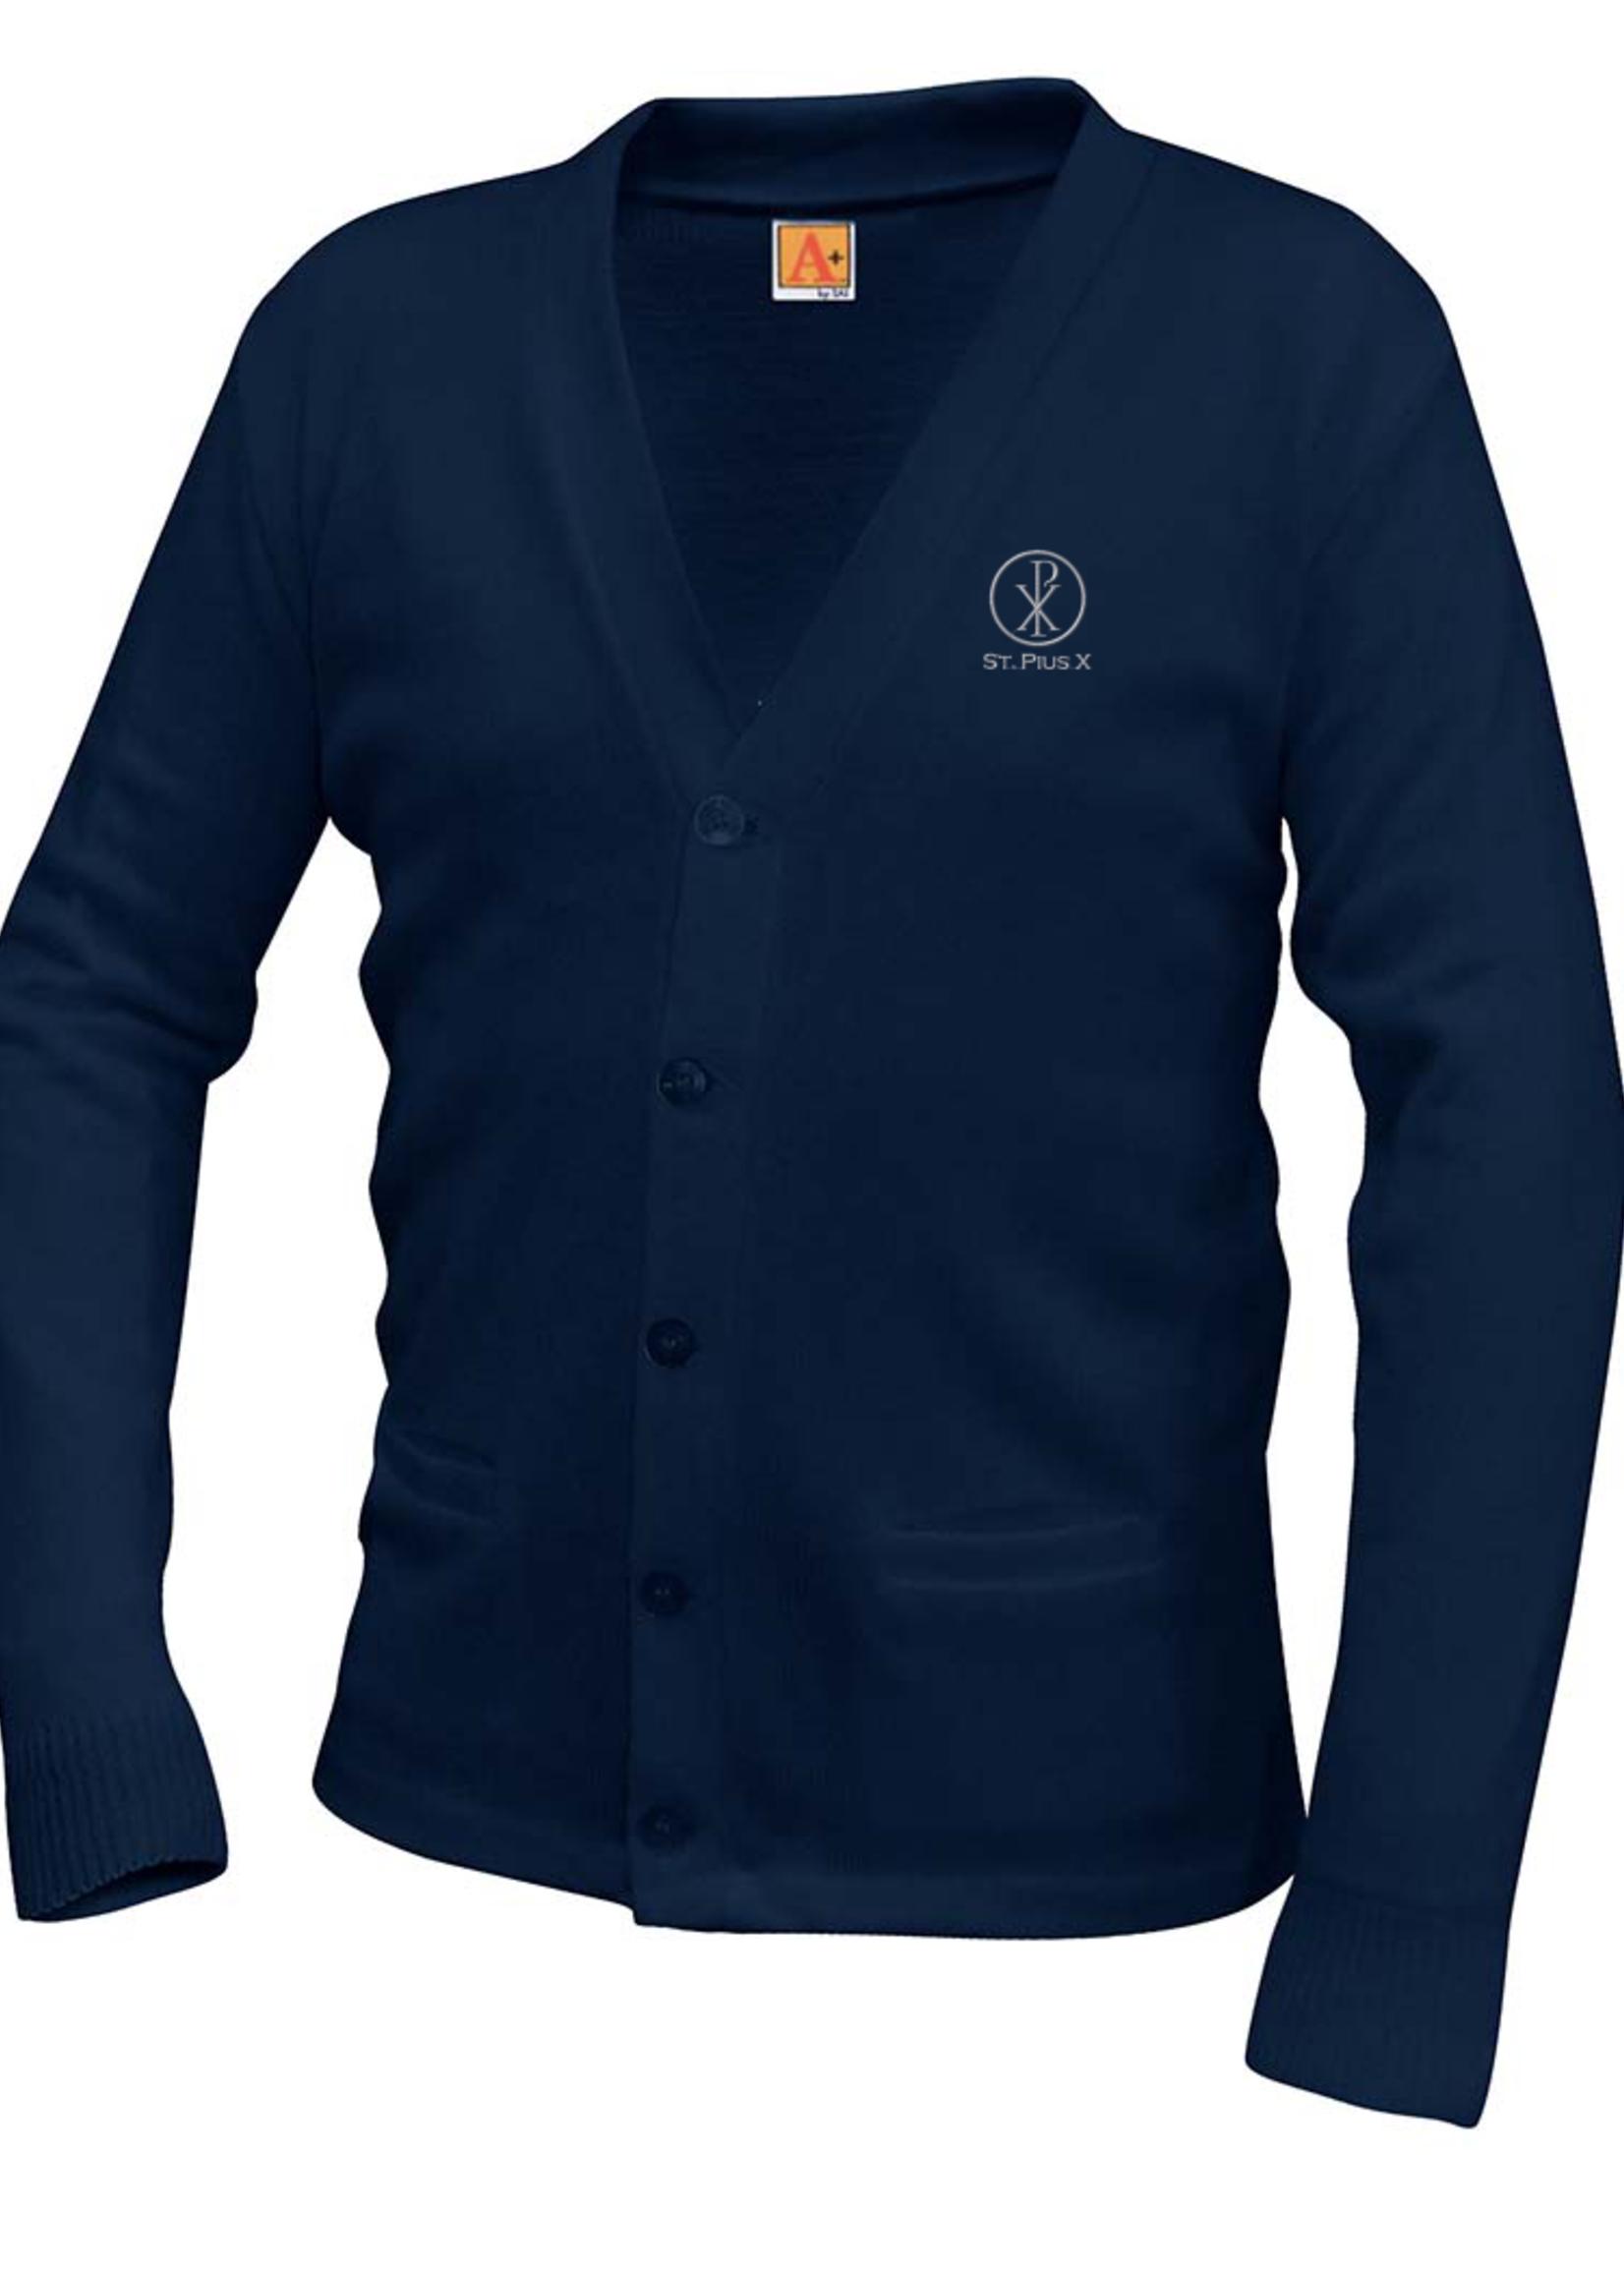 TUS SPX Navy V-neck cardigan sweater with pockets